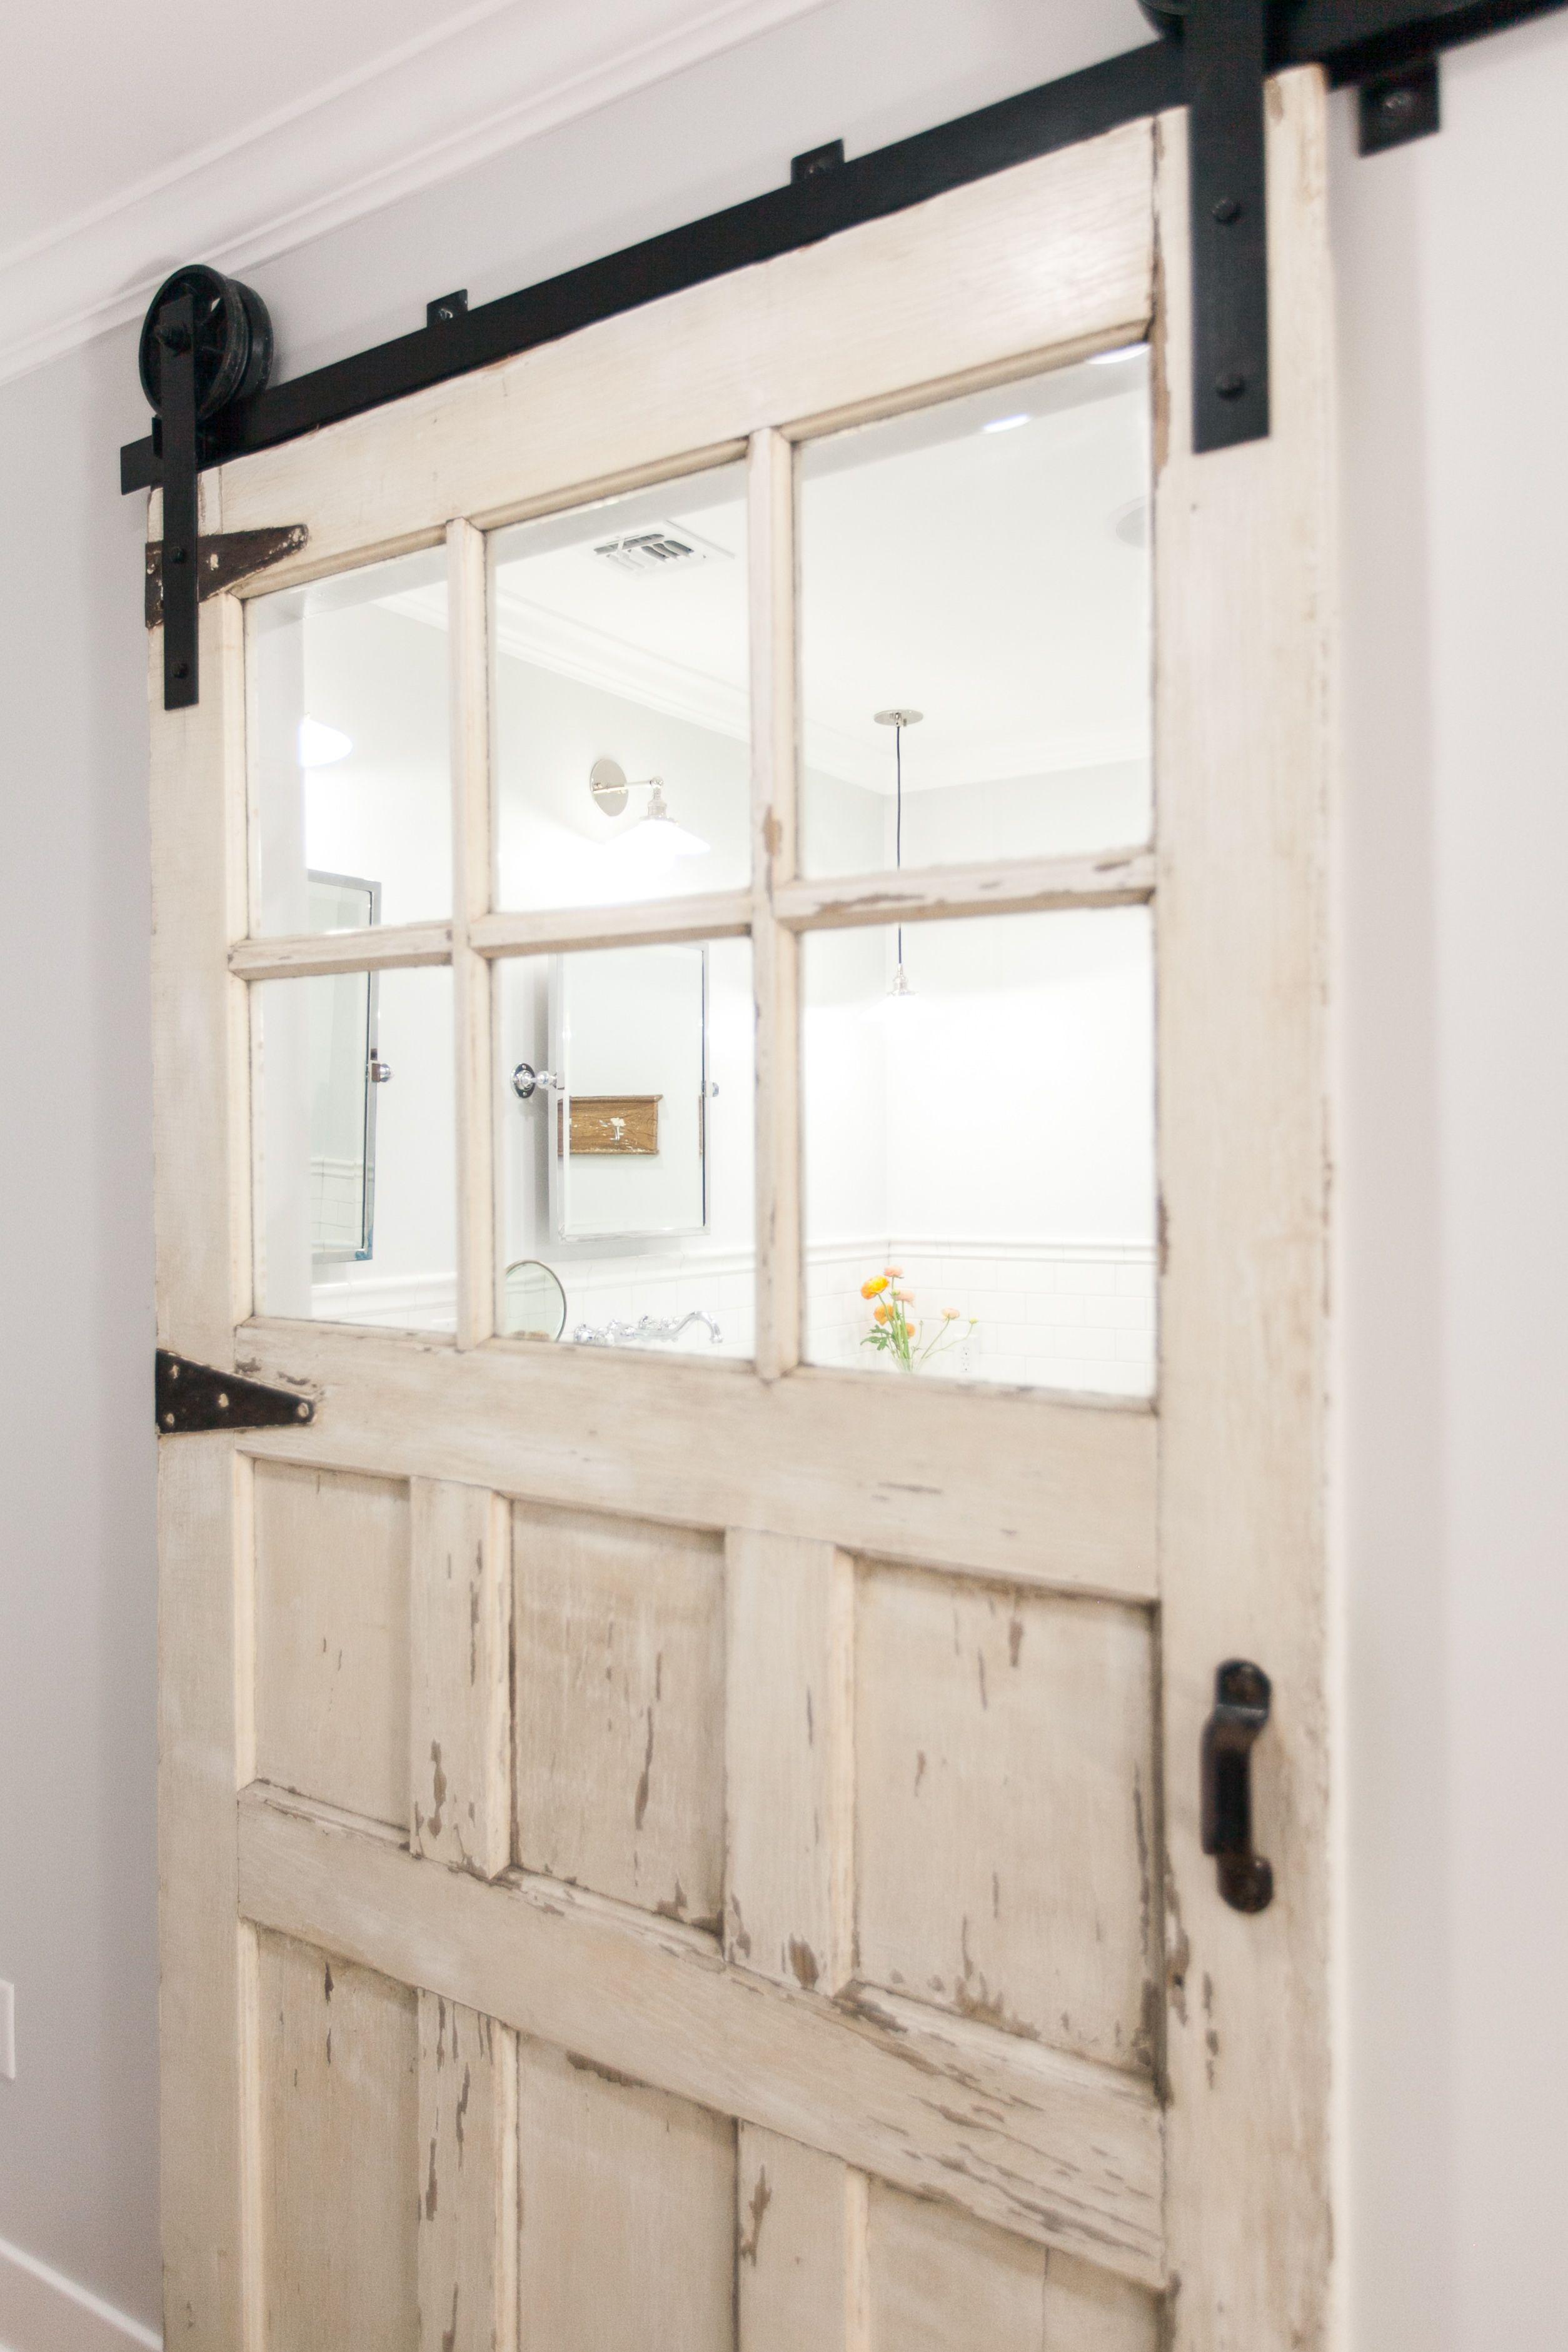 Master Bathroom Barn Door carriage style door on barn sliding track as master bath entry